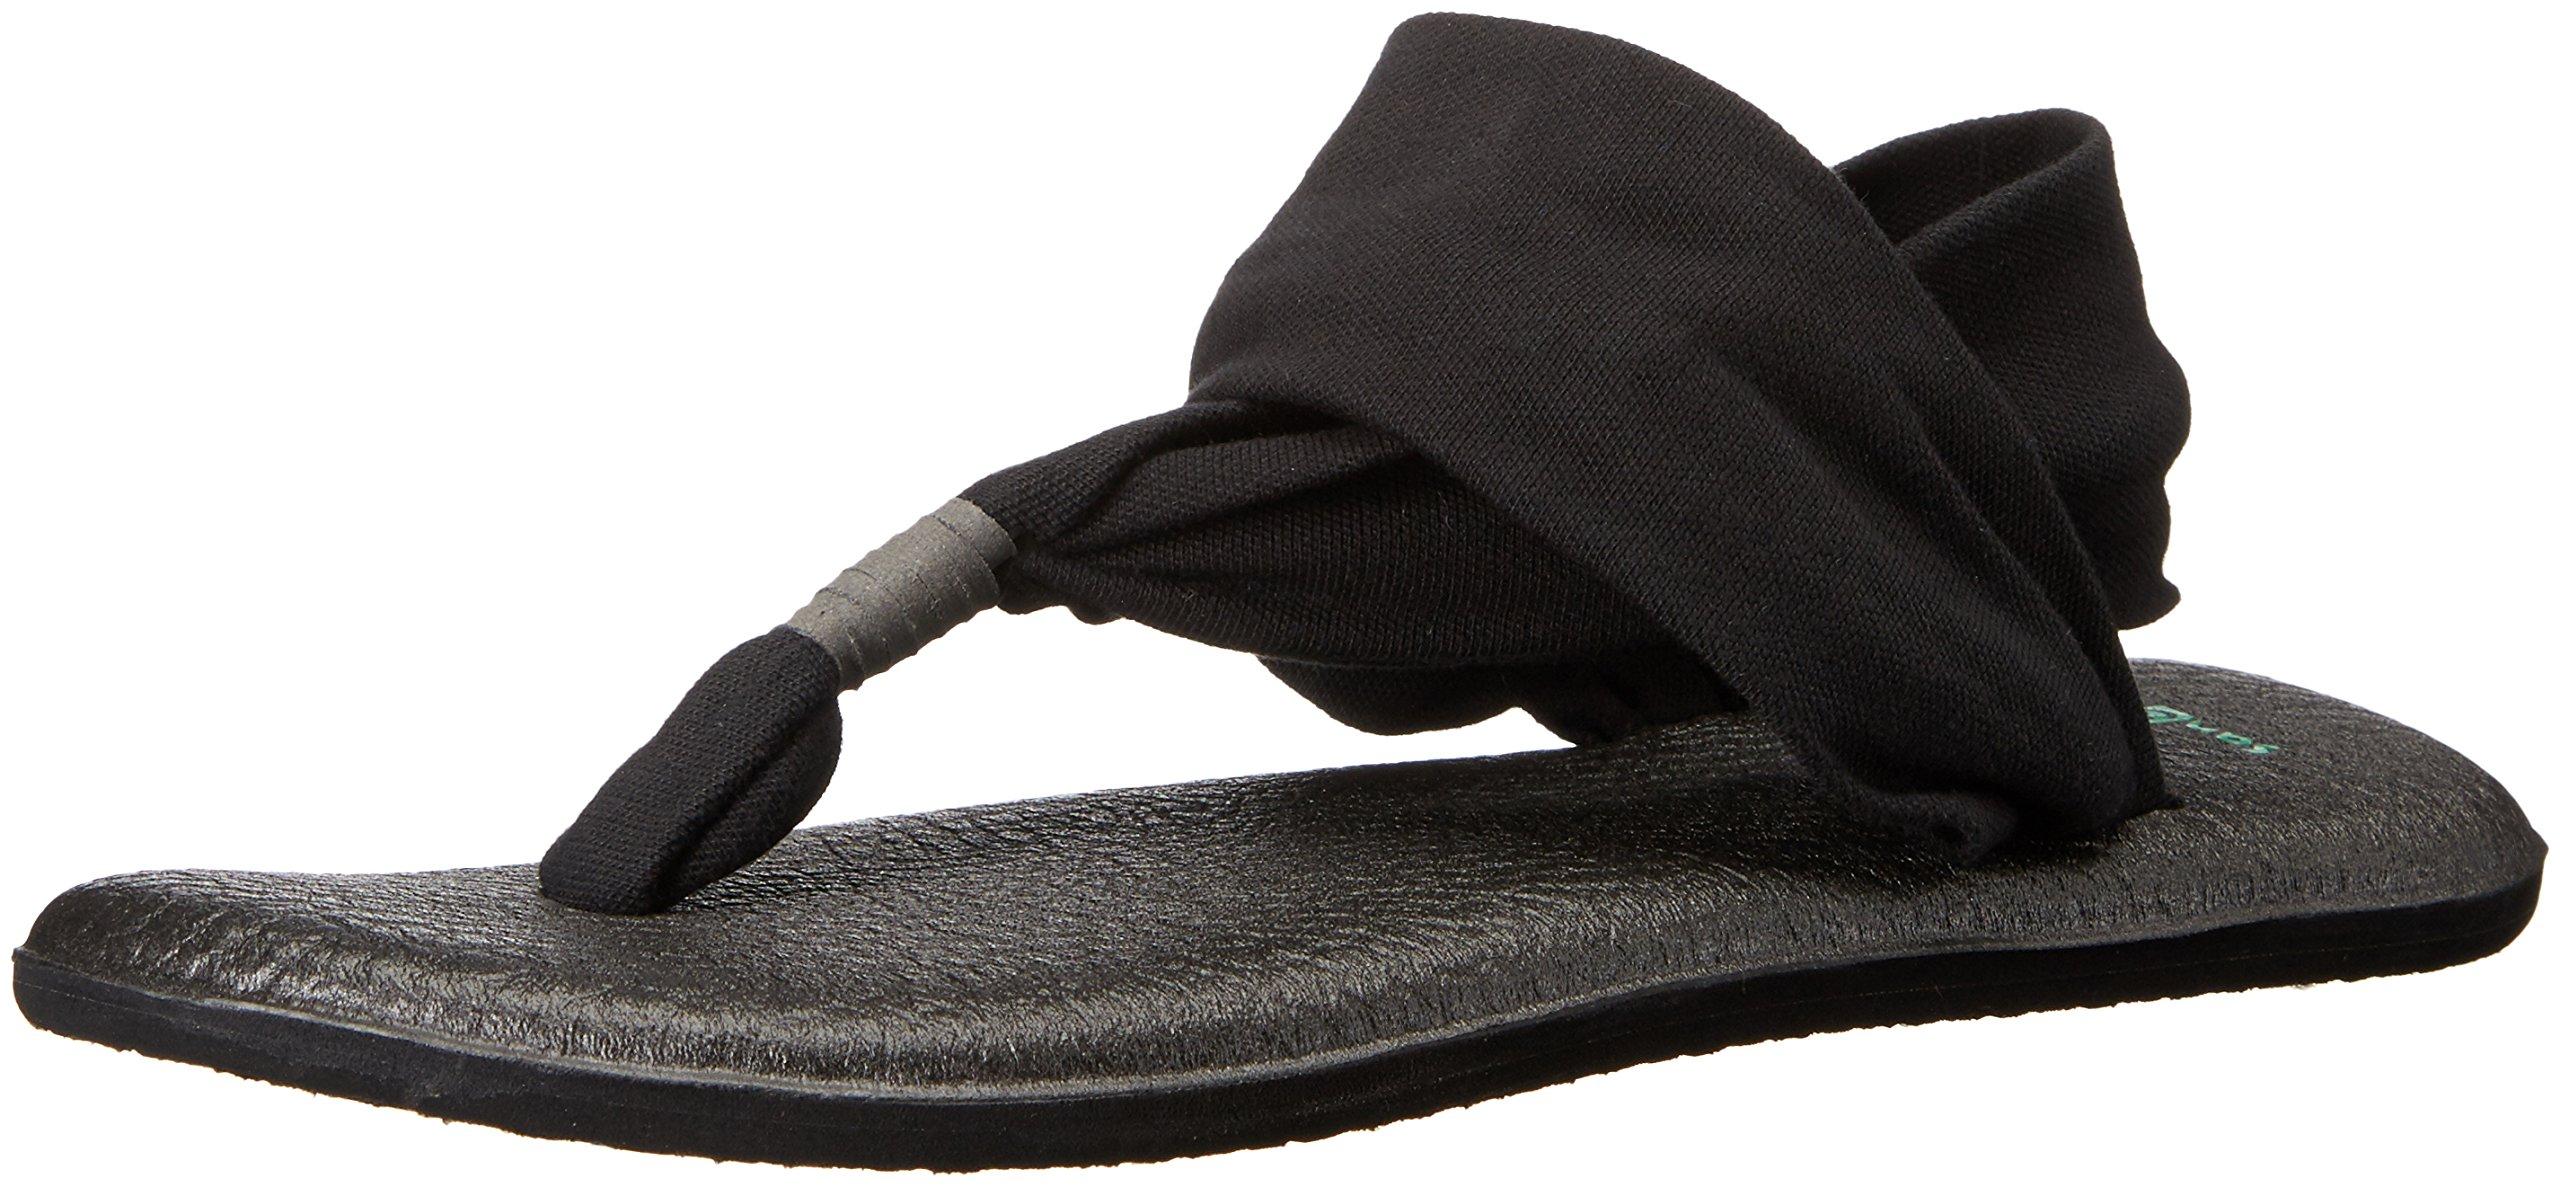 Sanuk Women's Yoga Sling 2 Flip Flop,Black,9 M US by Sanuk